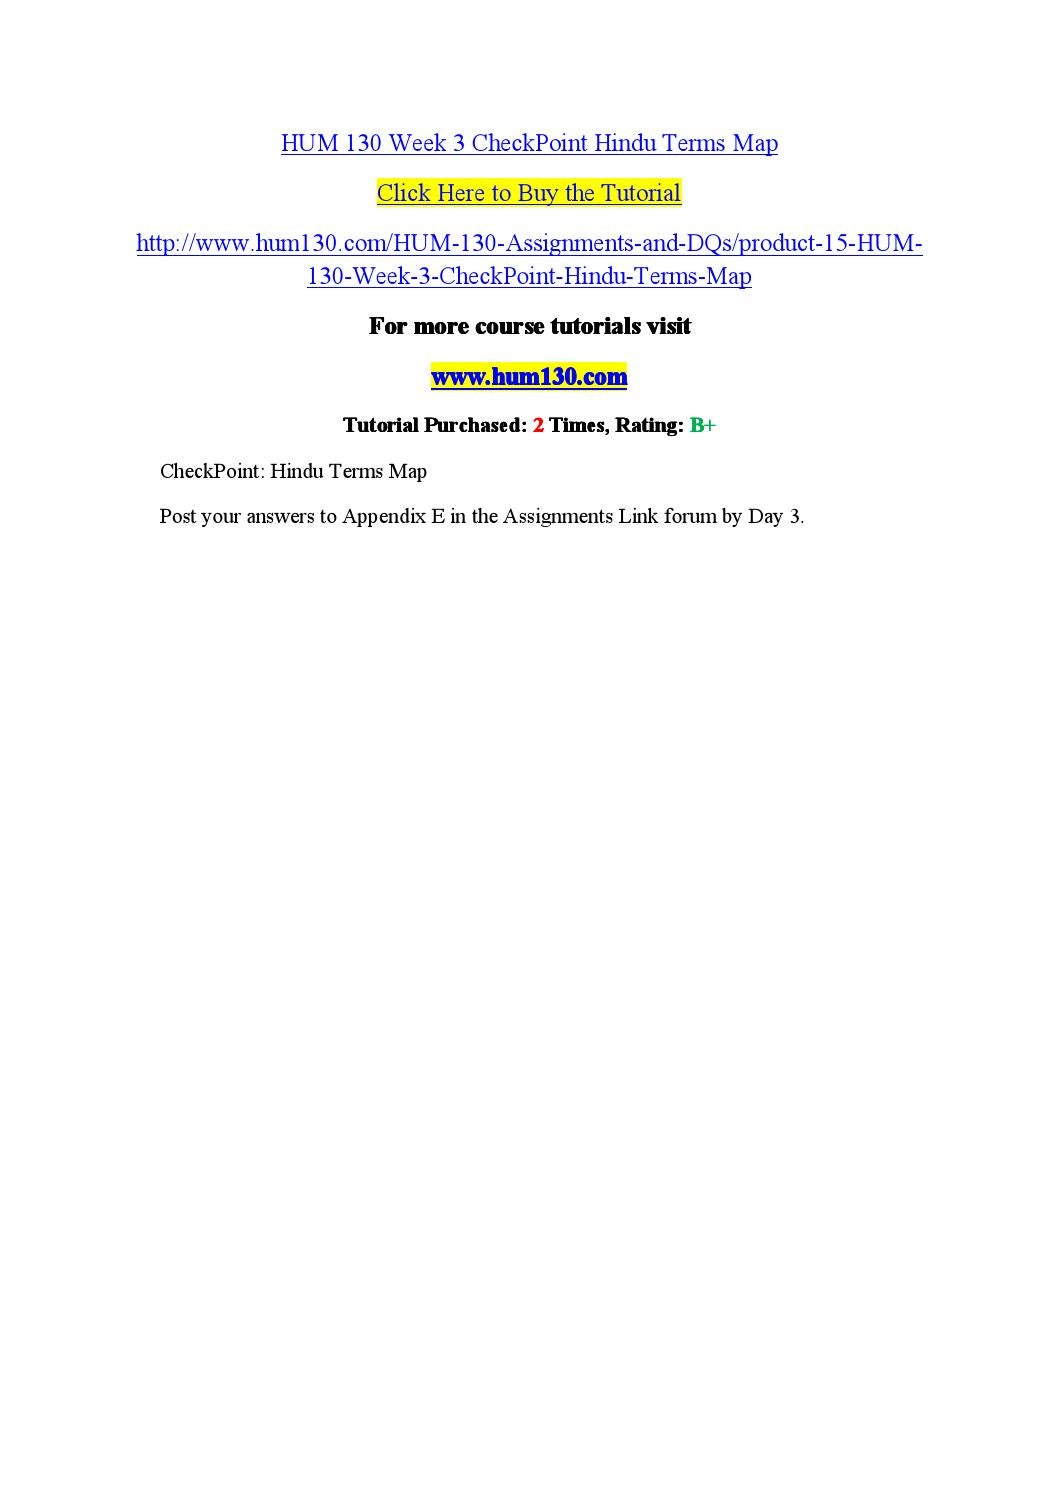 hum 130 appendix b week 4 Hum 130 week 2 dq 2 hum 130 week 3 appendix e -hindu terms map hum 130 week 3 assignment - hinduism paper hum 130 week 4 appendix b - final project preparation full transcript more presentations by camelia boor.